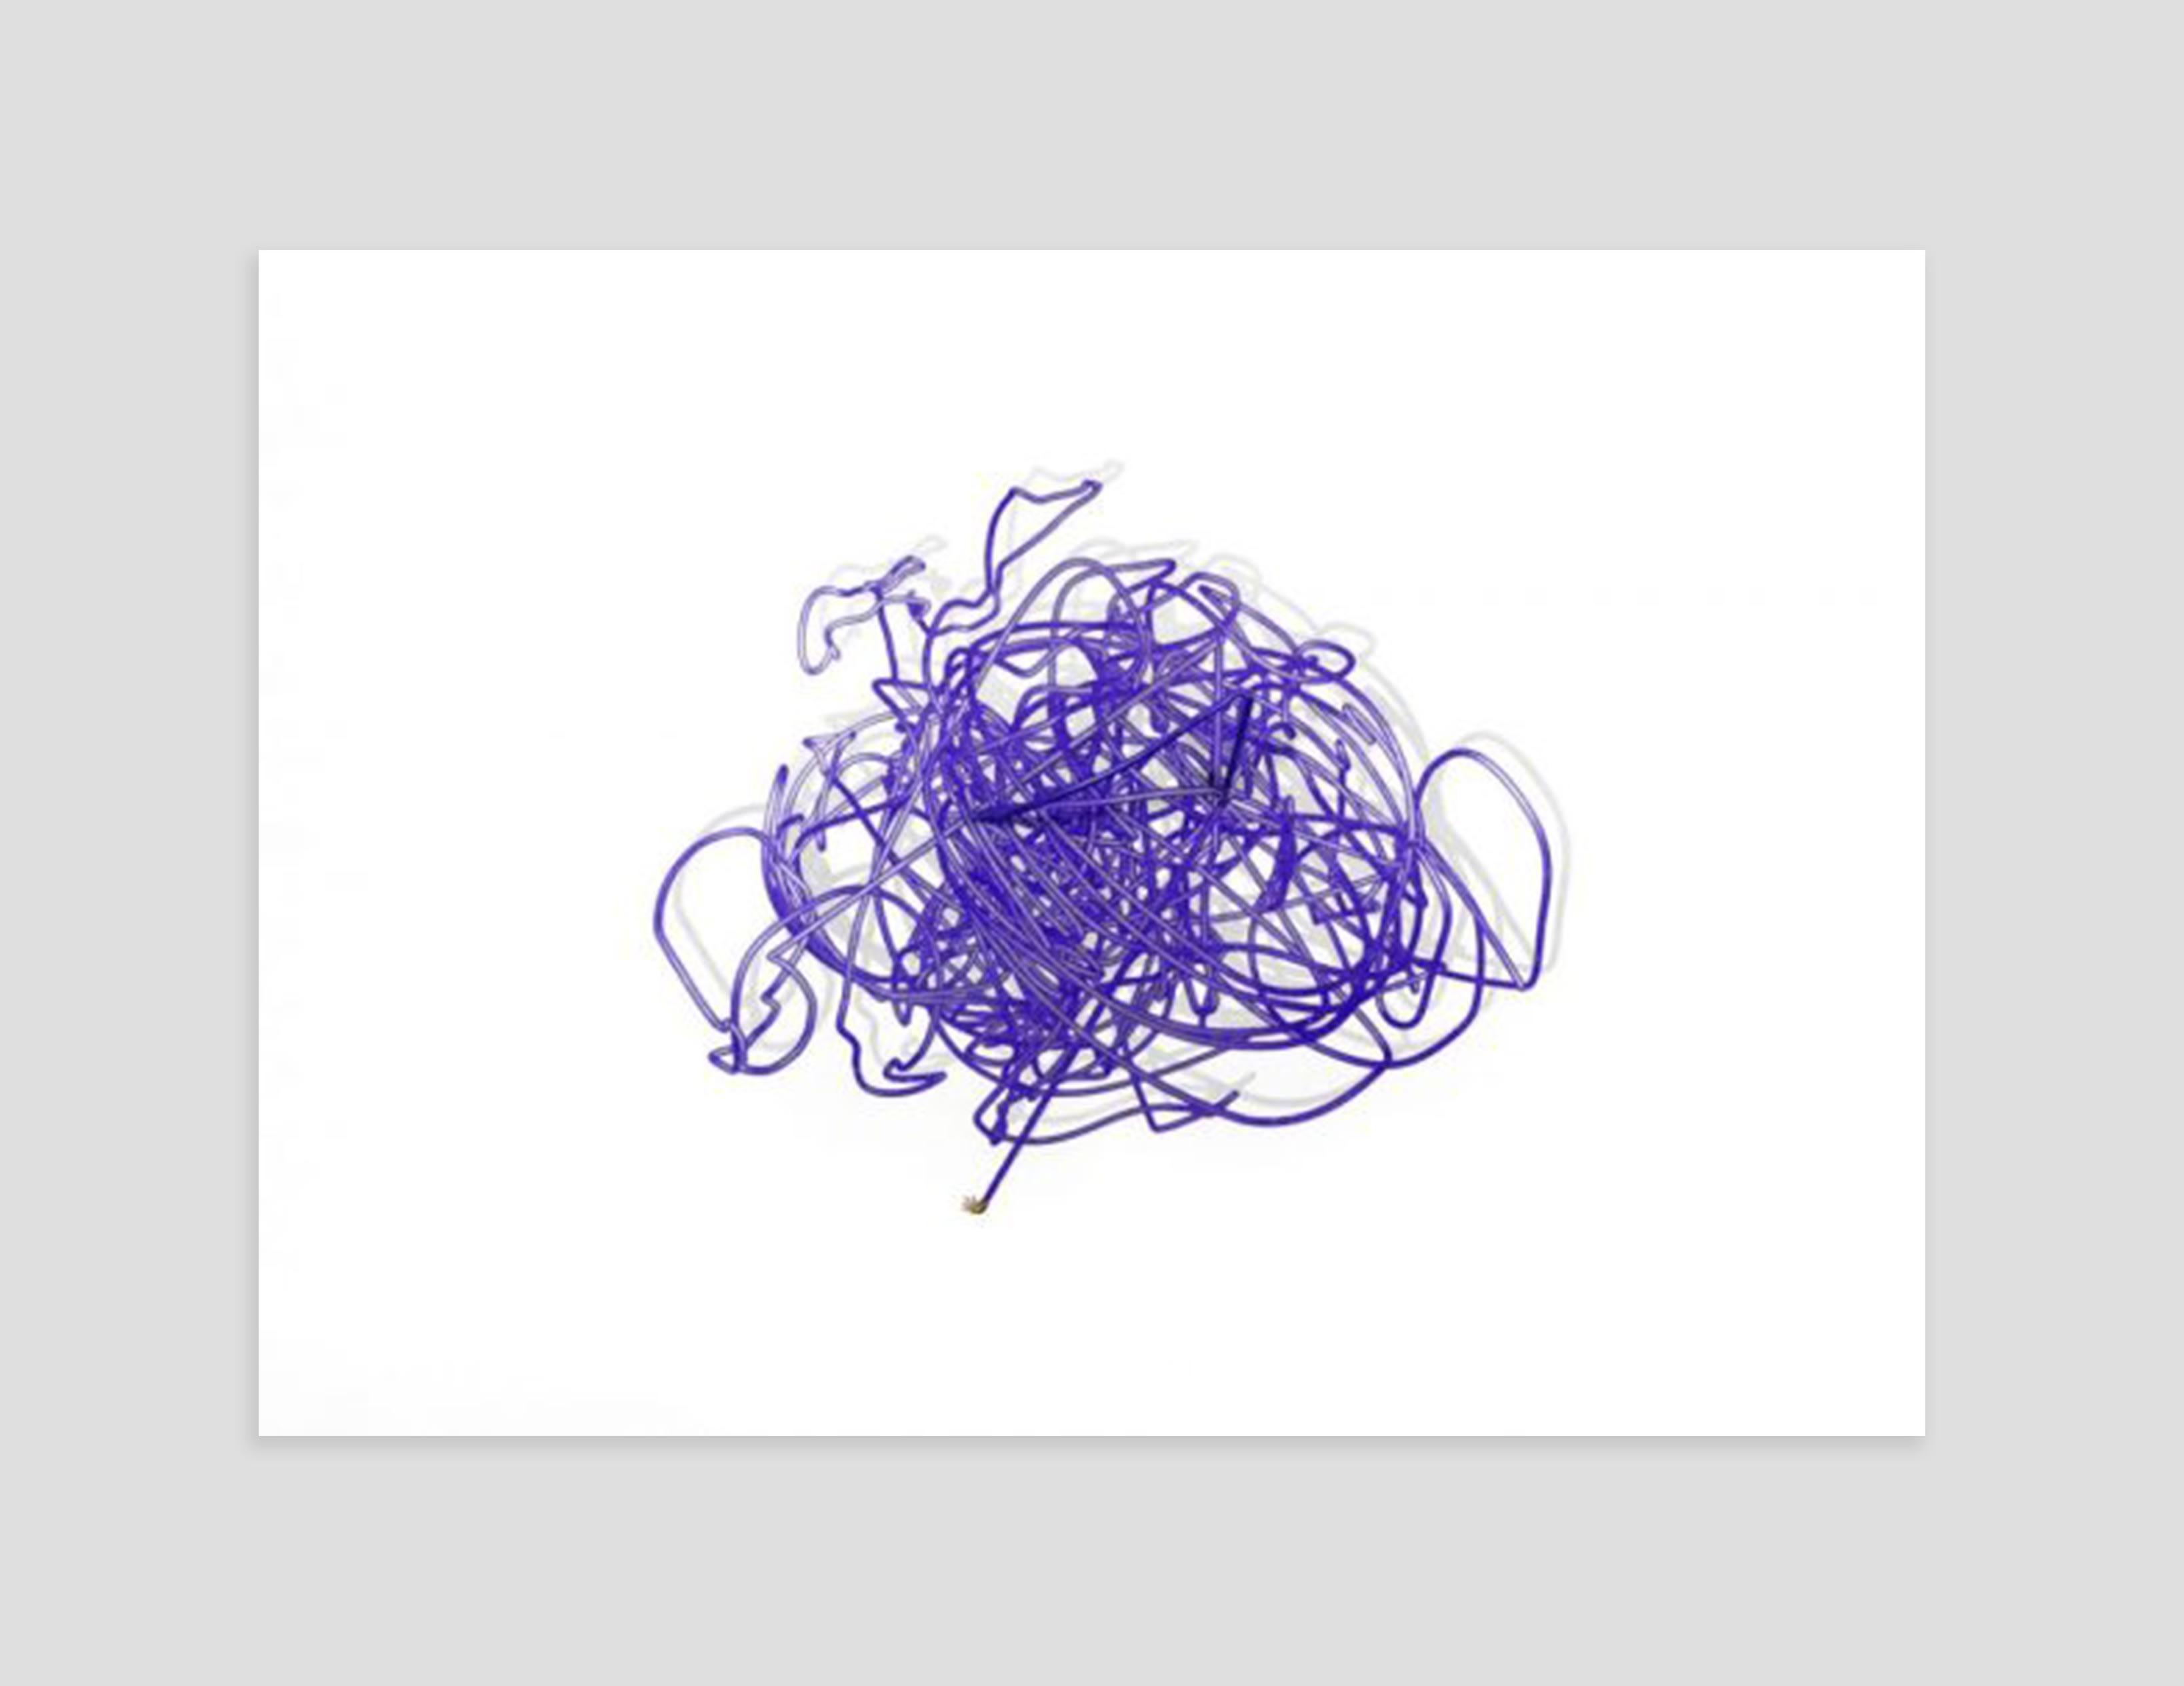 Fine Art Print by Rashaad Newsome at Zane Bennett Contemporary Art